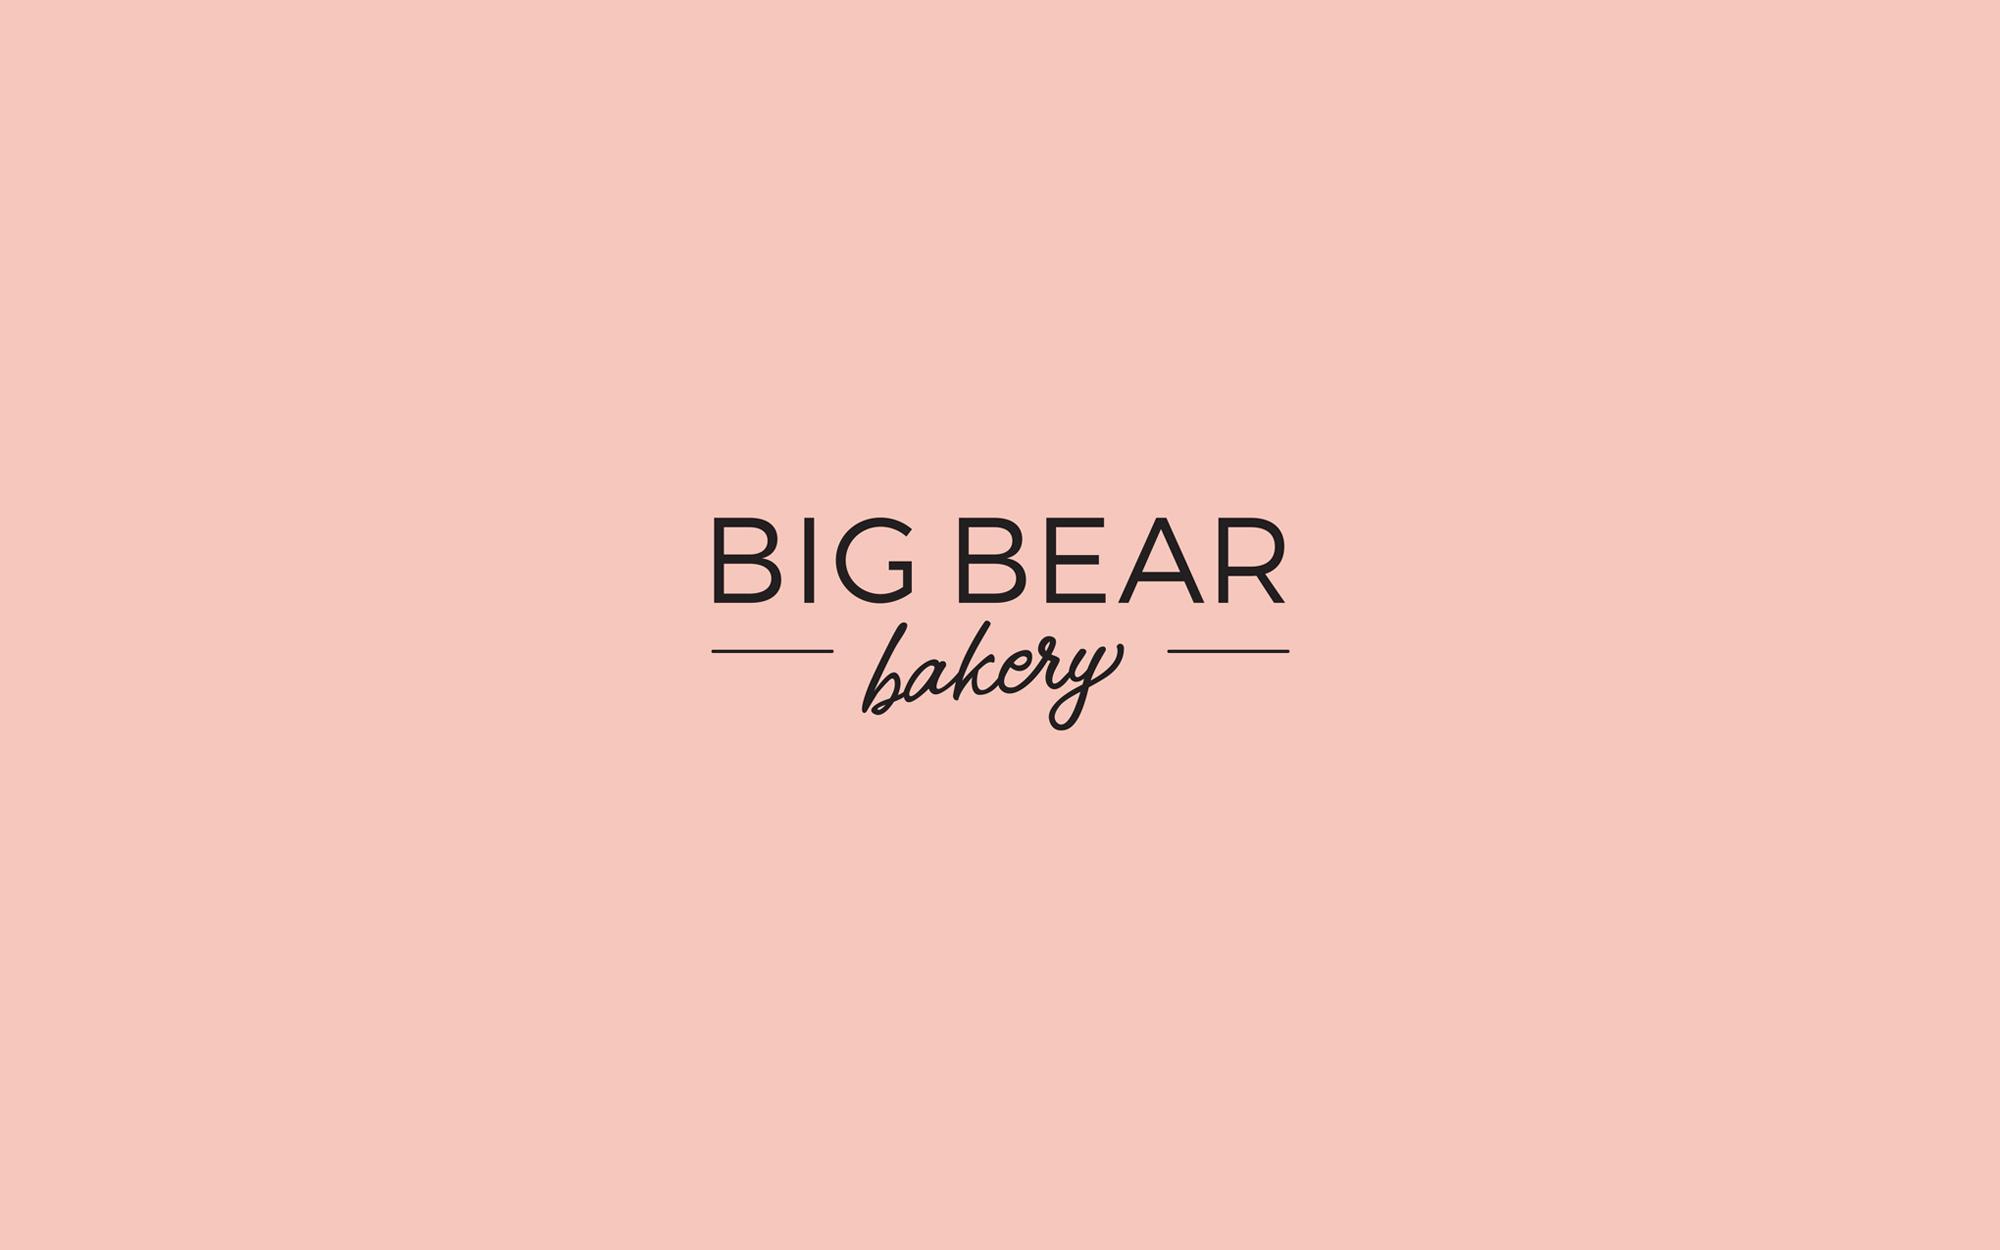 logo-design-graphic-glasgow-big-bear-bakery-walnut-wasp.jpg